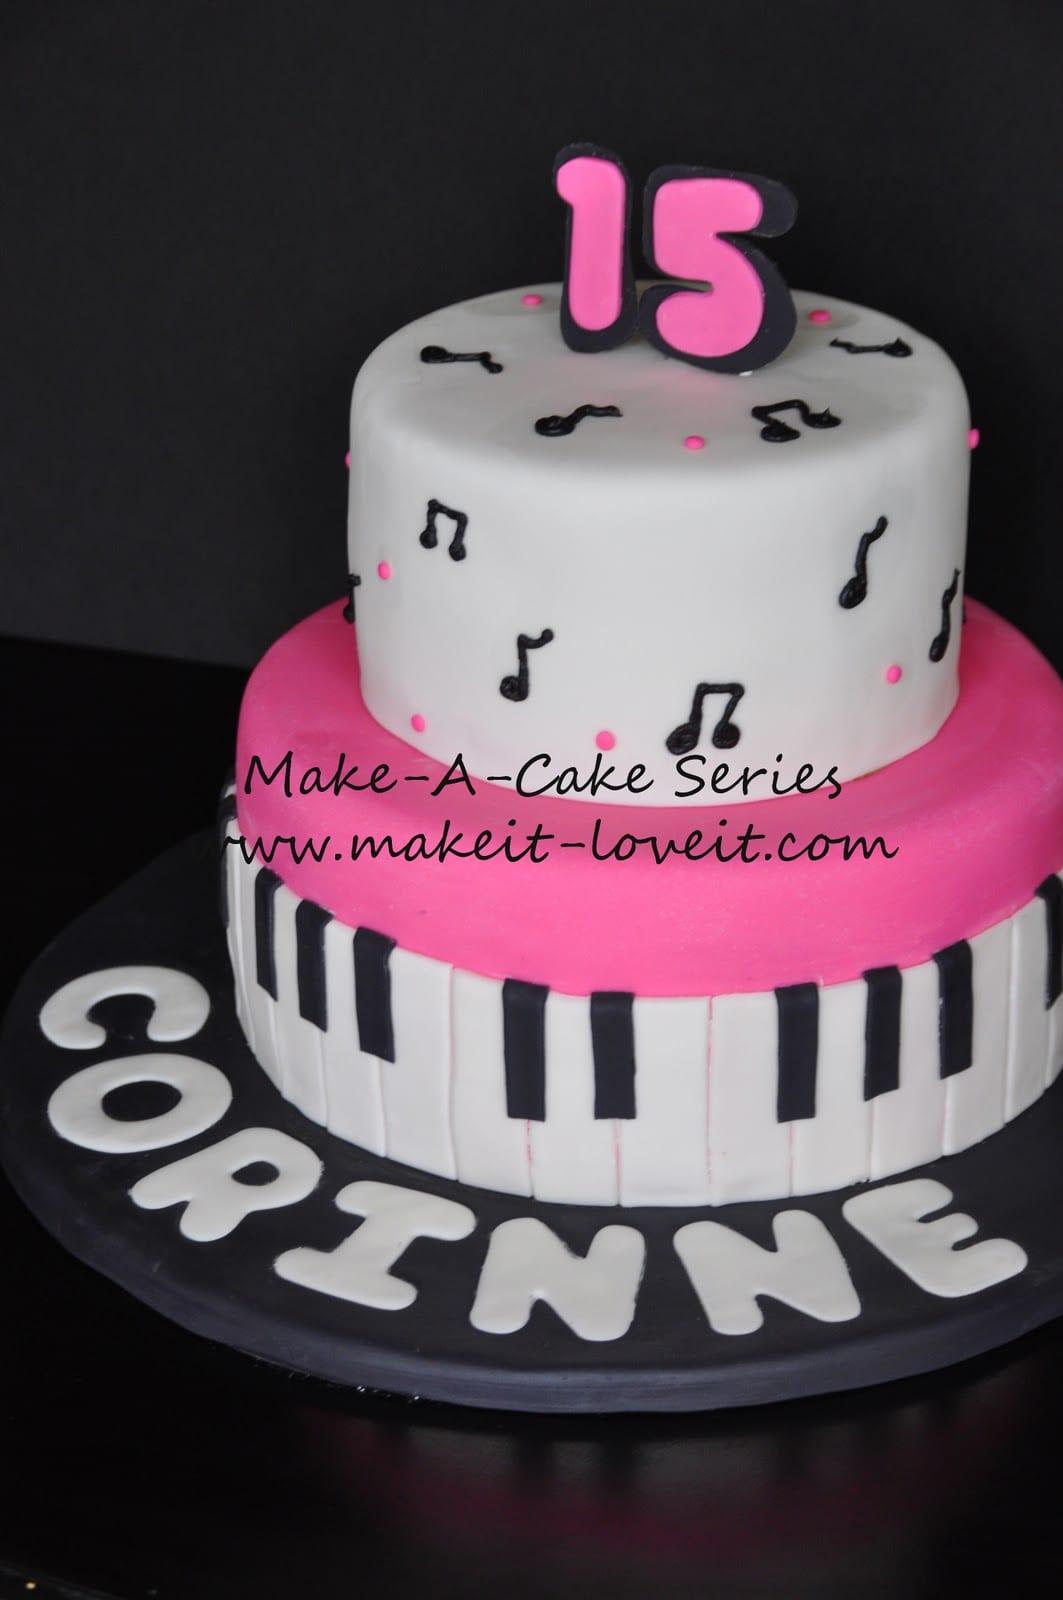 Make-a-Cake Series: Music Cake